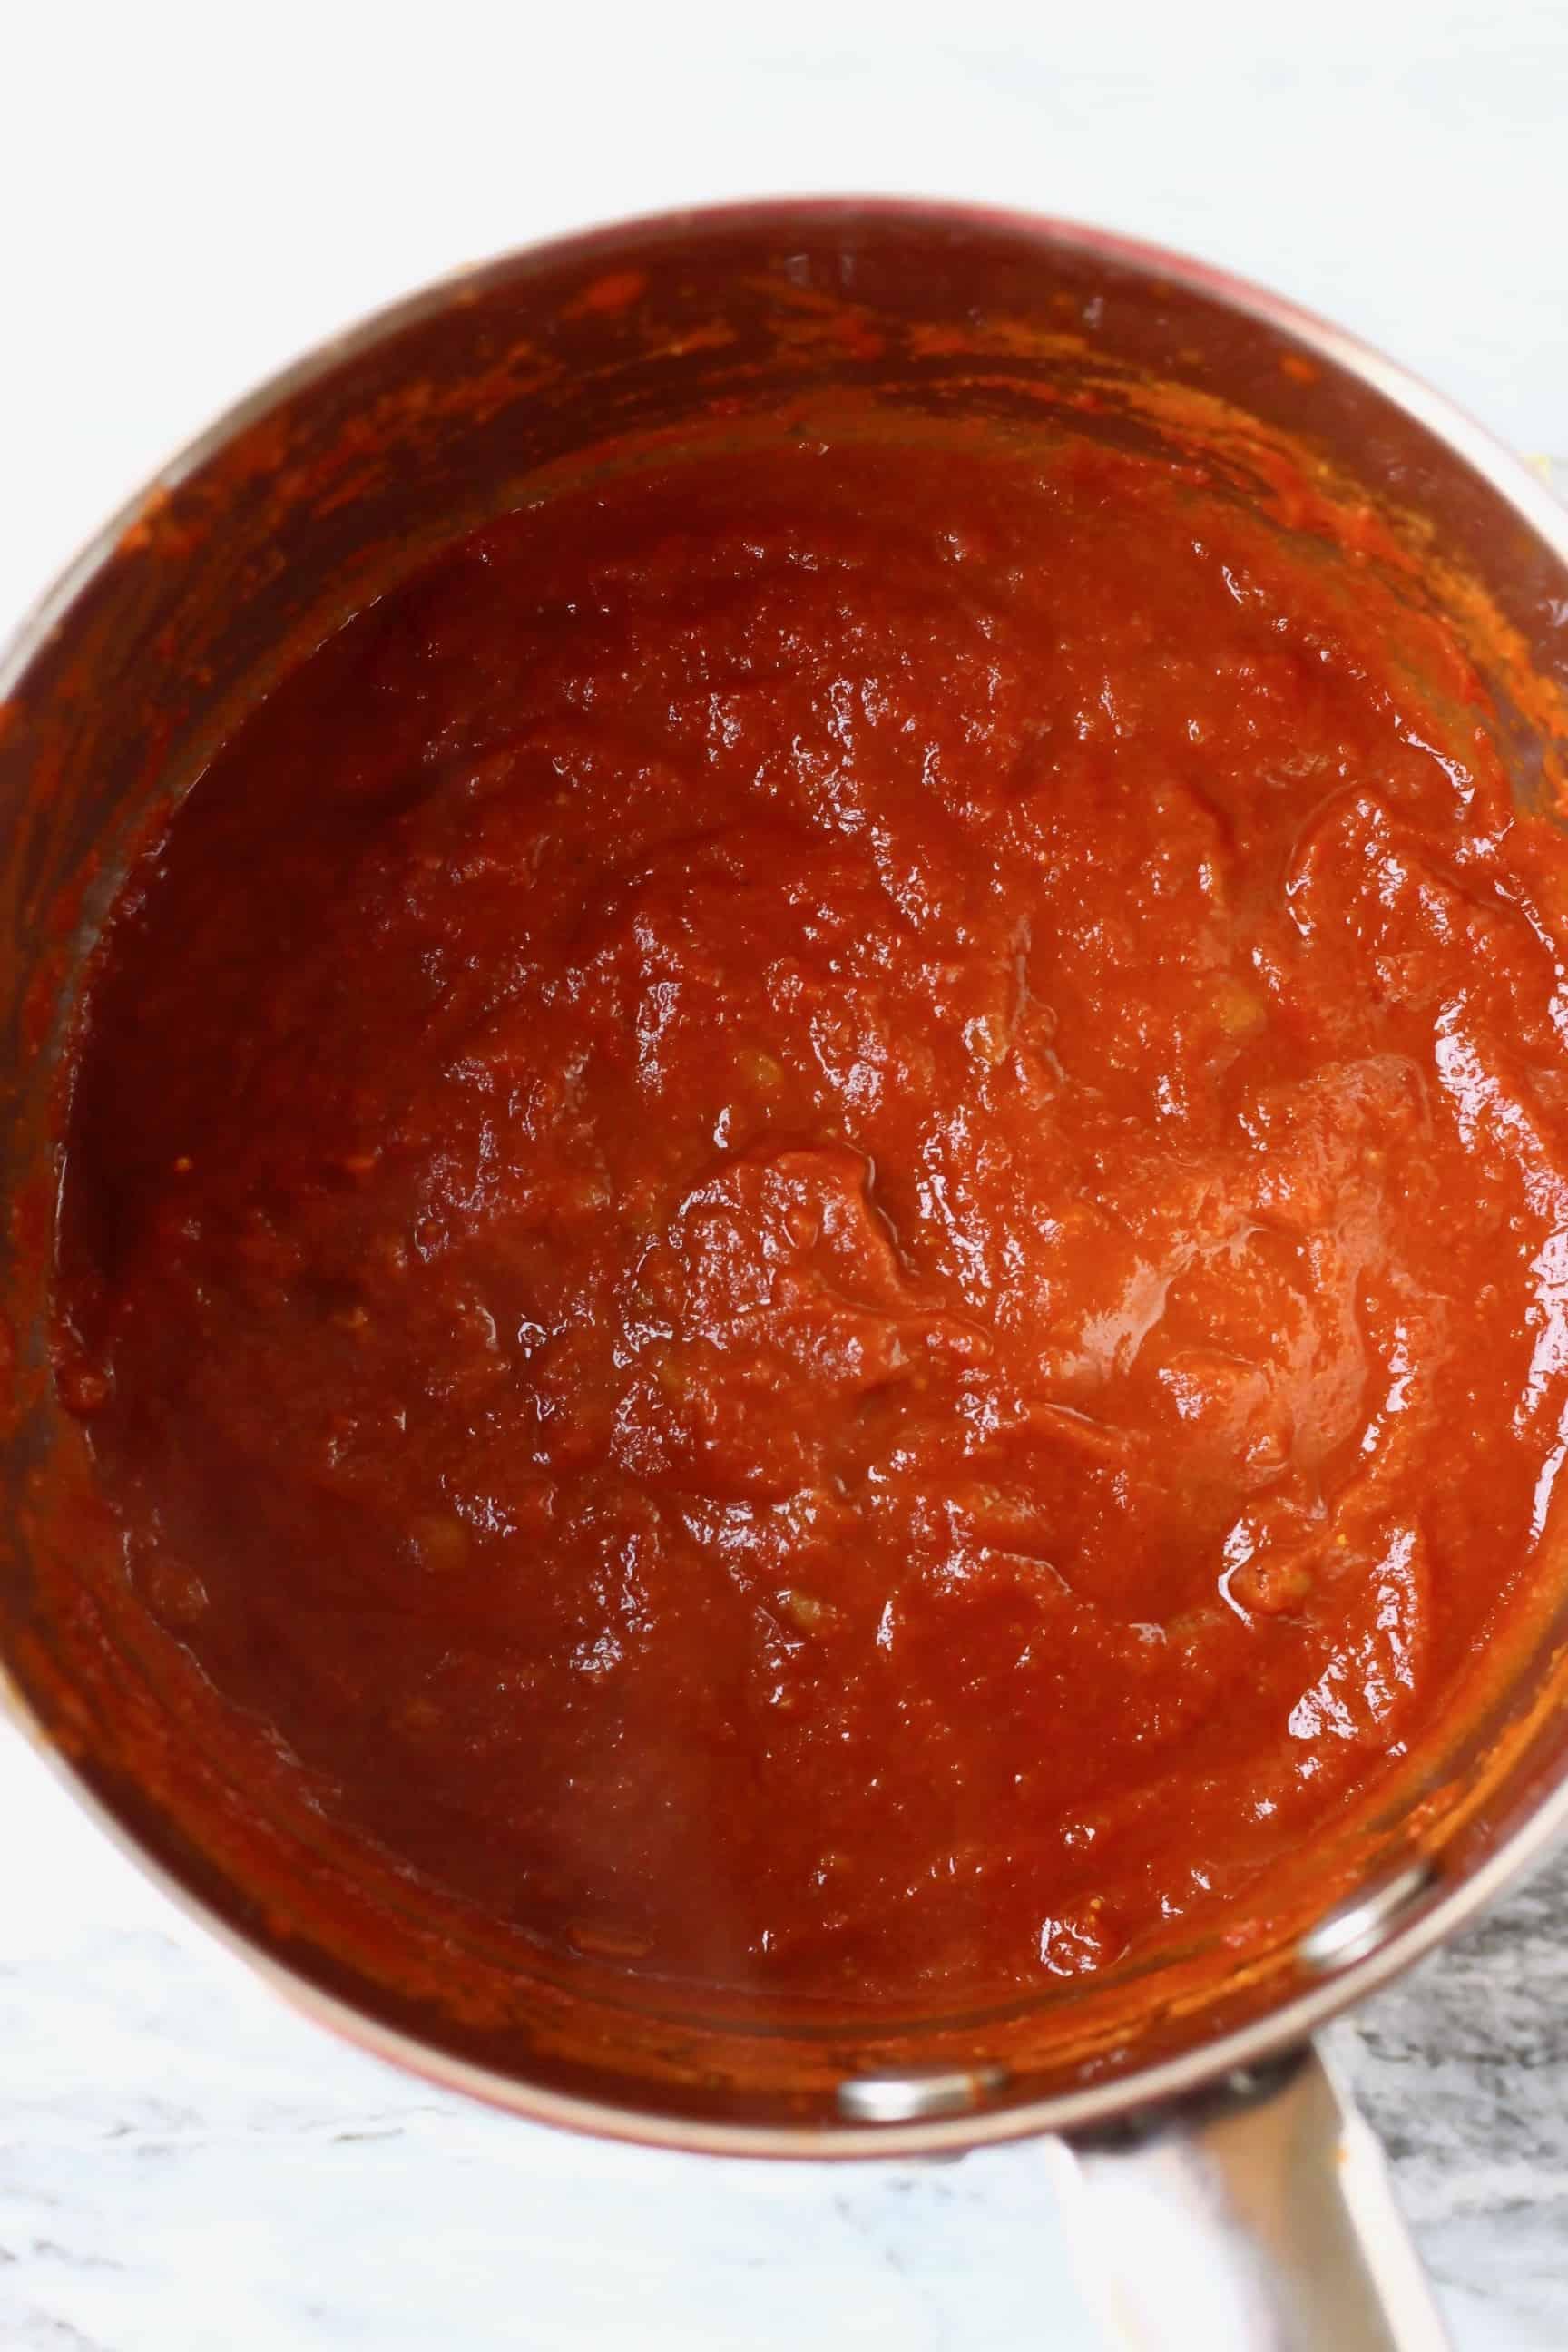 Blended vegan BBQ sauce in a silver saucepan